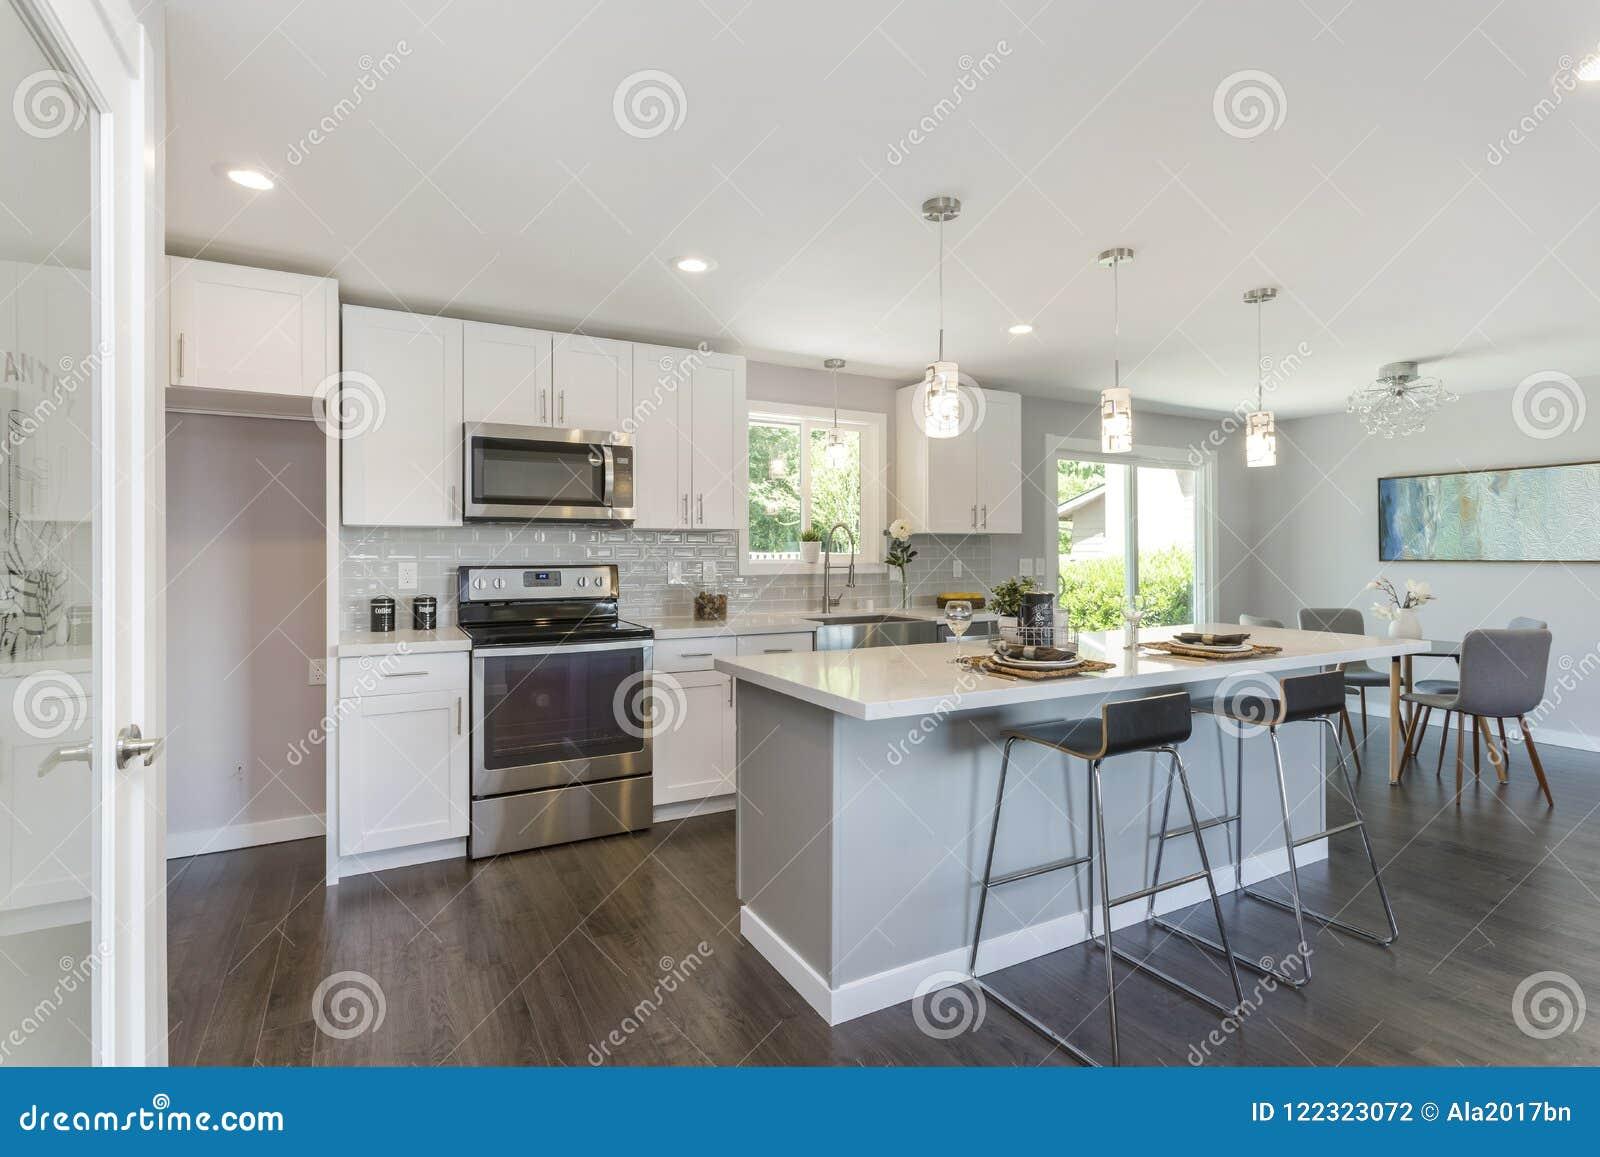 Gorgeous Kitchen With Open Concept Floorplan Stock Photo Image Of Large Kitchen 122323072